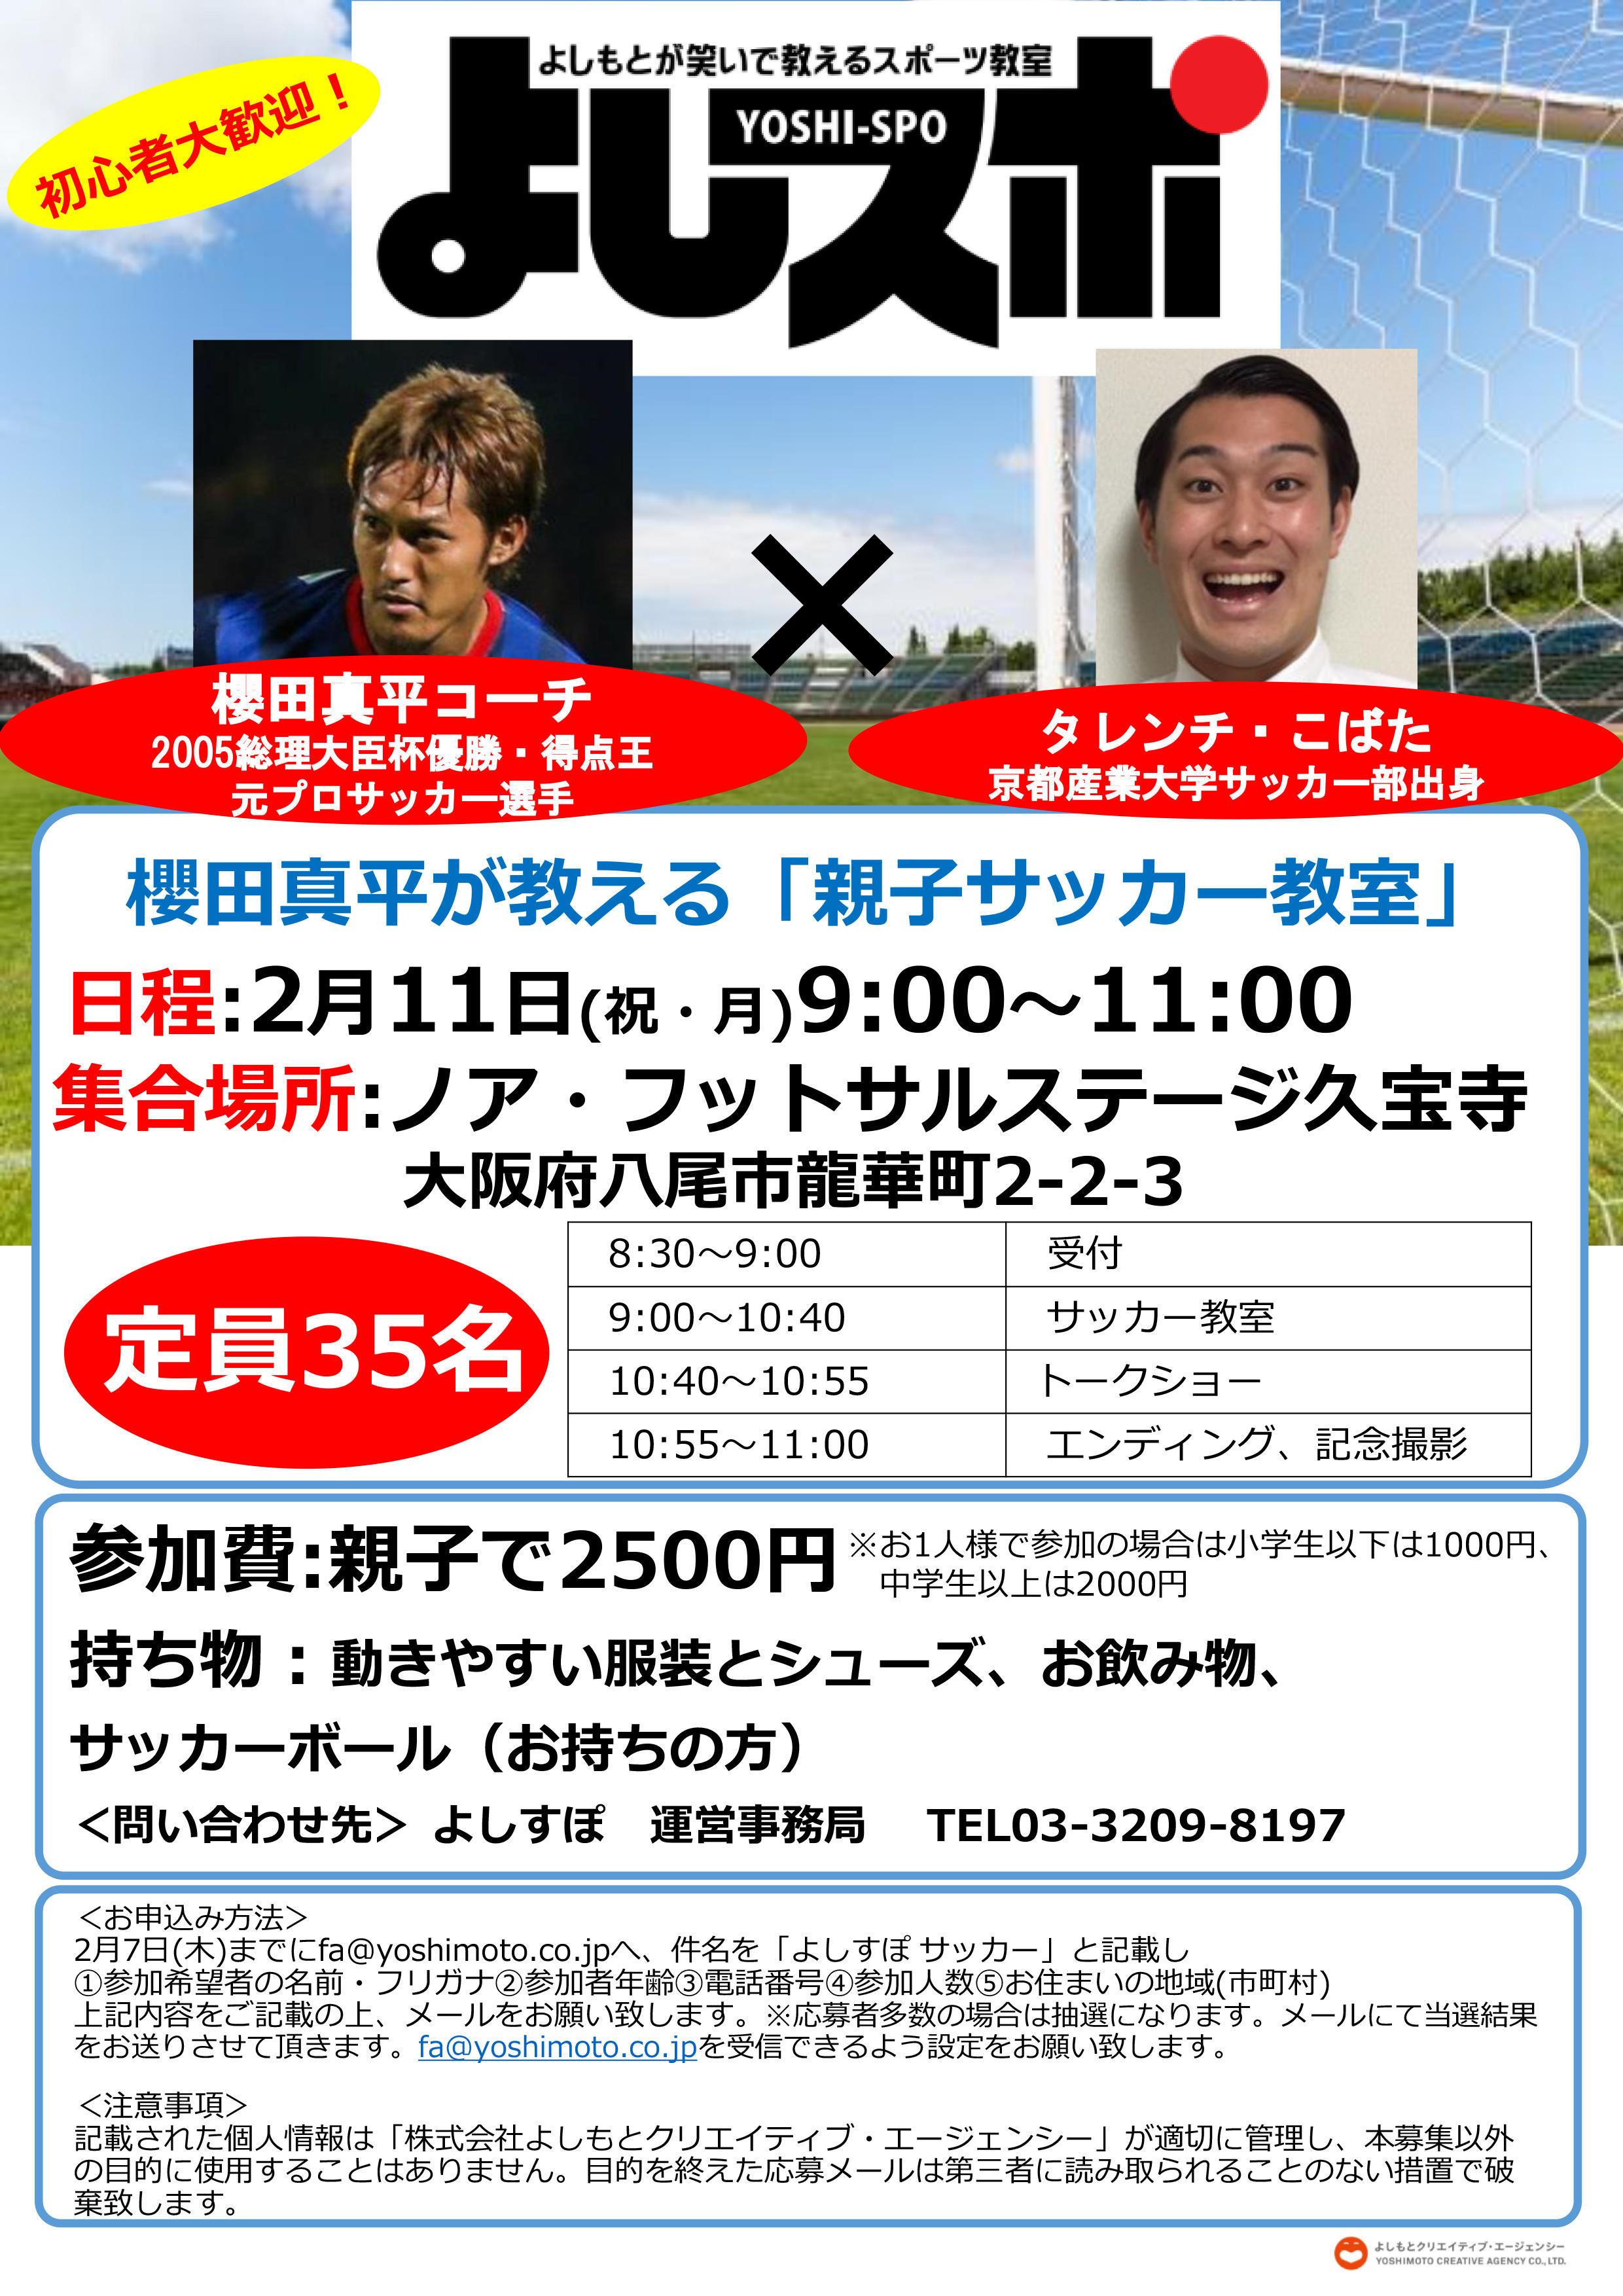 http://news.yoshimoto.co.jp/20181130191213-62c9dabd9f8265c43c946836ad622319588d995e.jpg